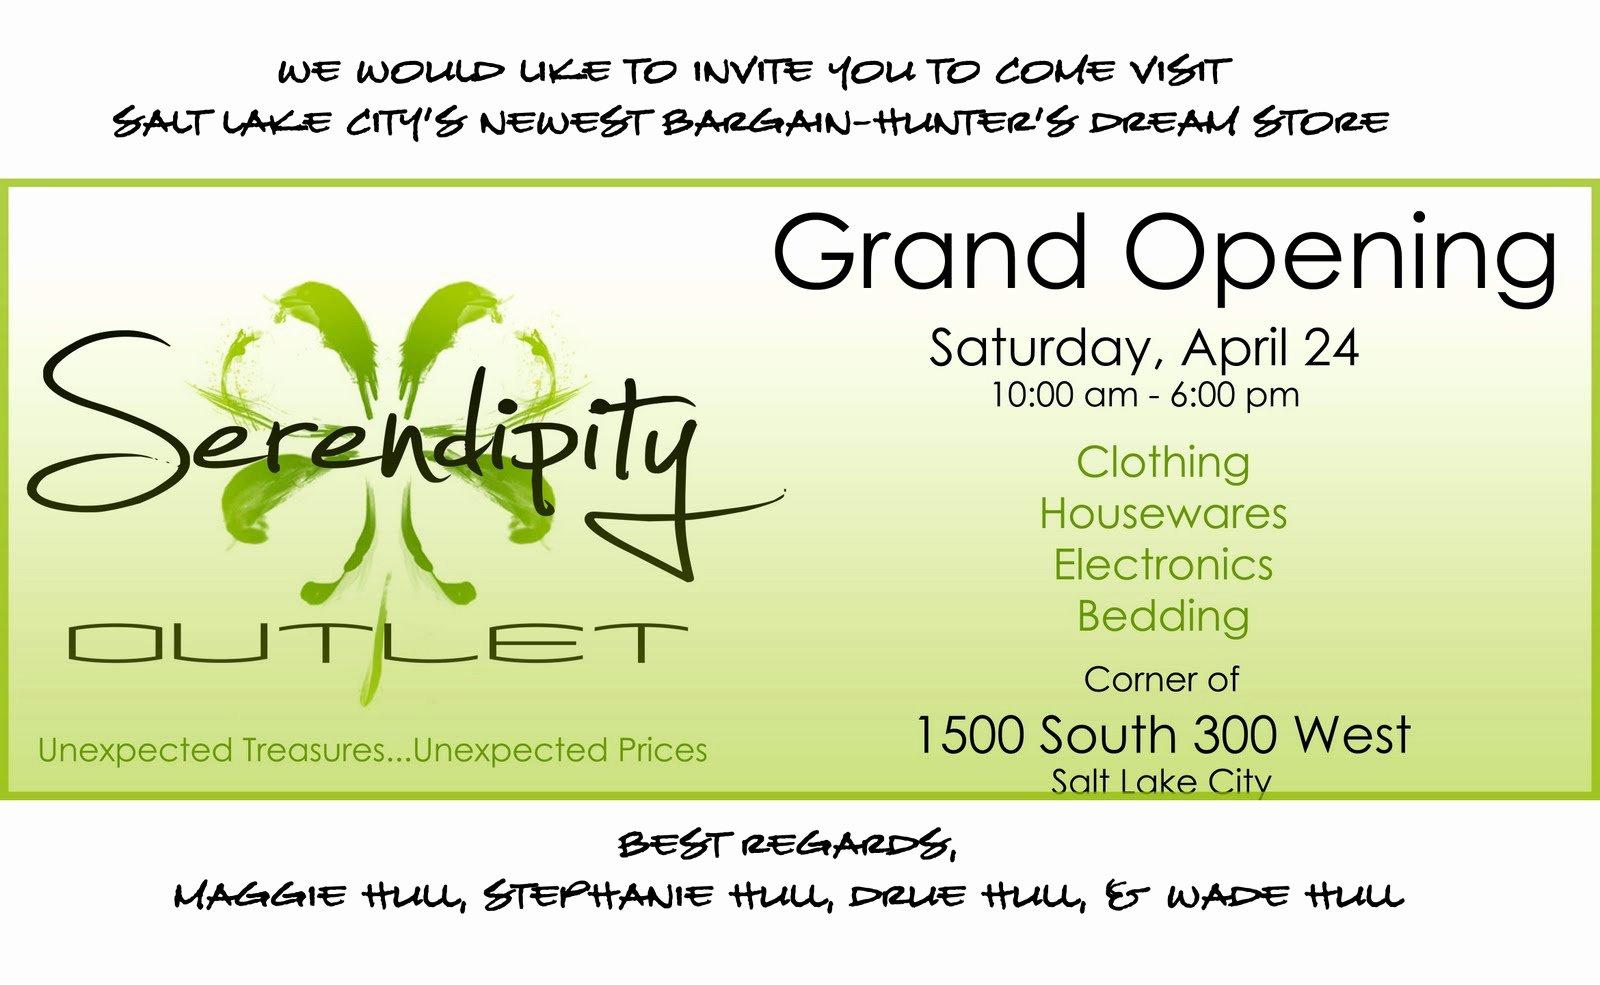 Grand Opening Invitation Template Fresh Inaugural Invitation Template